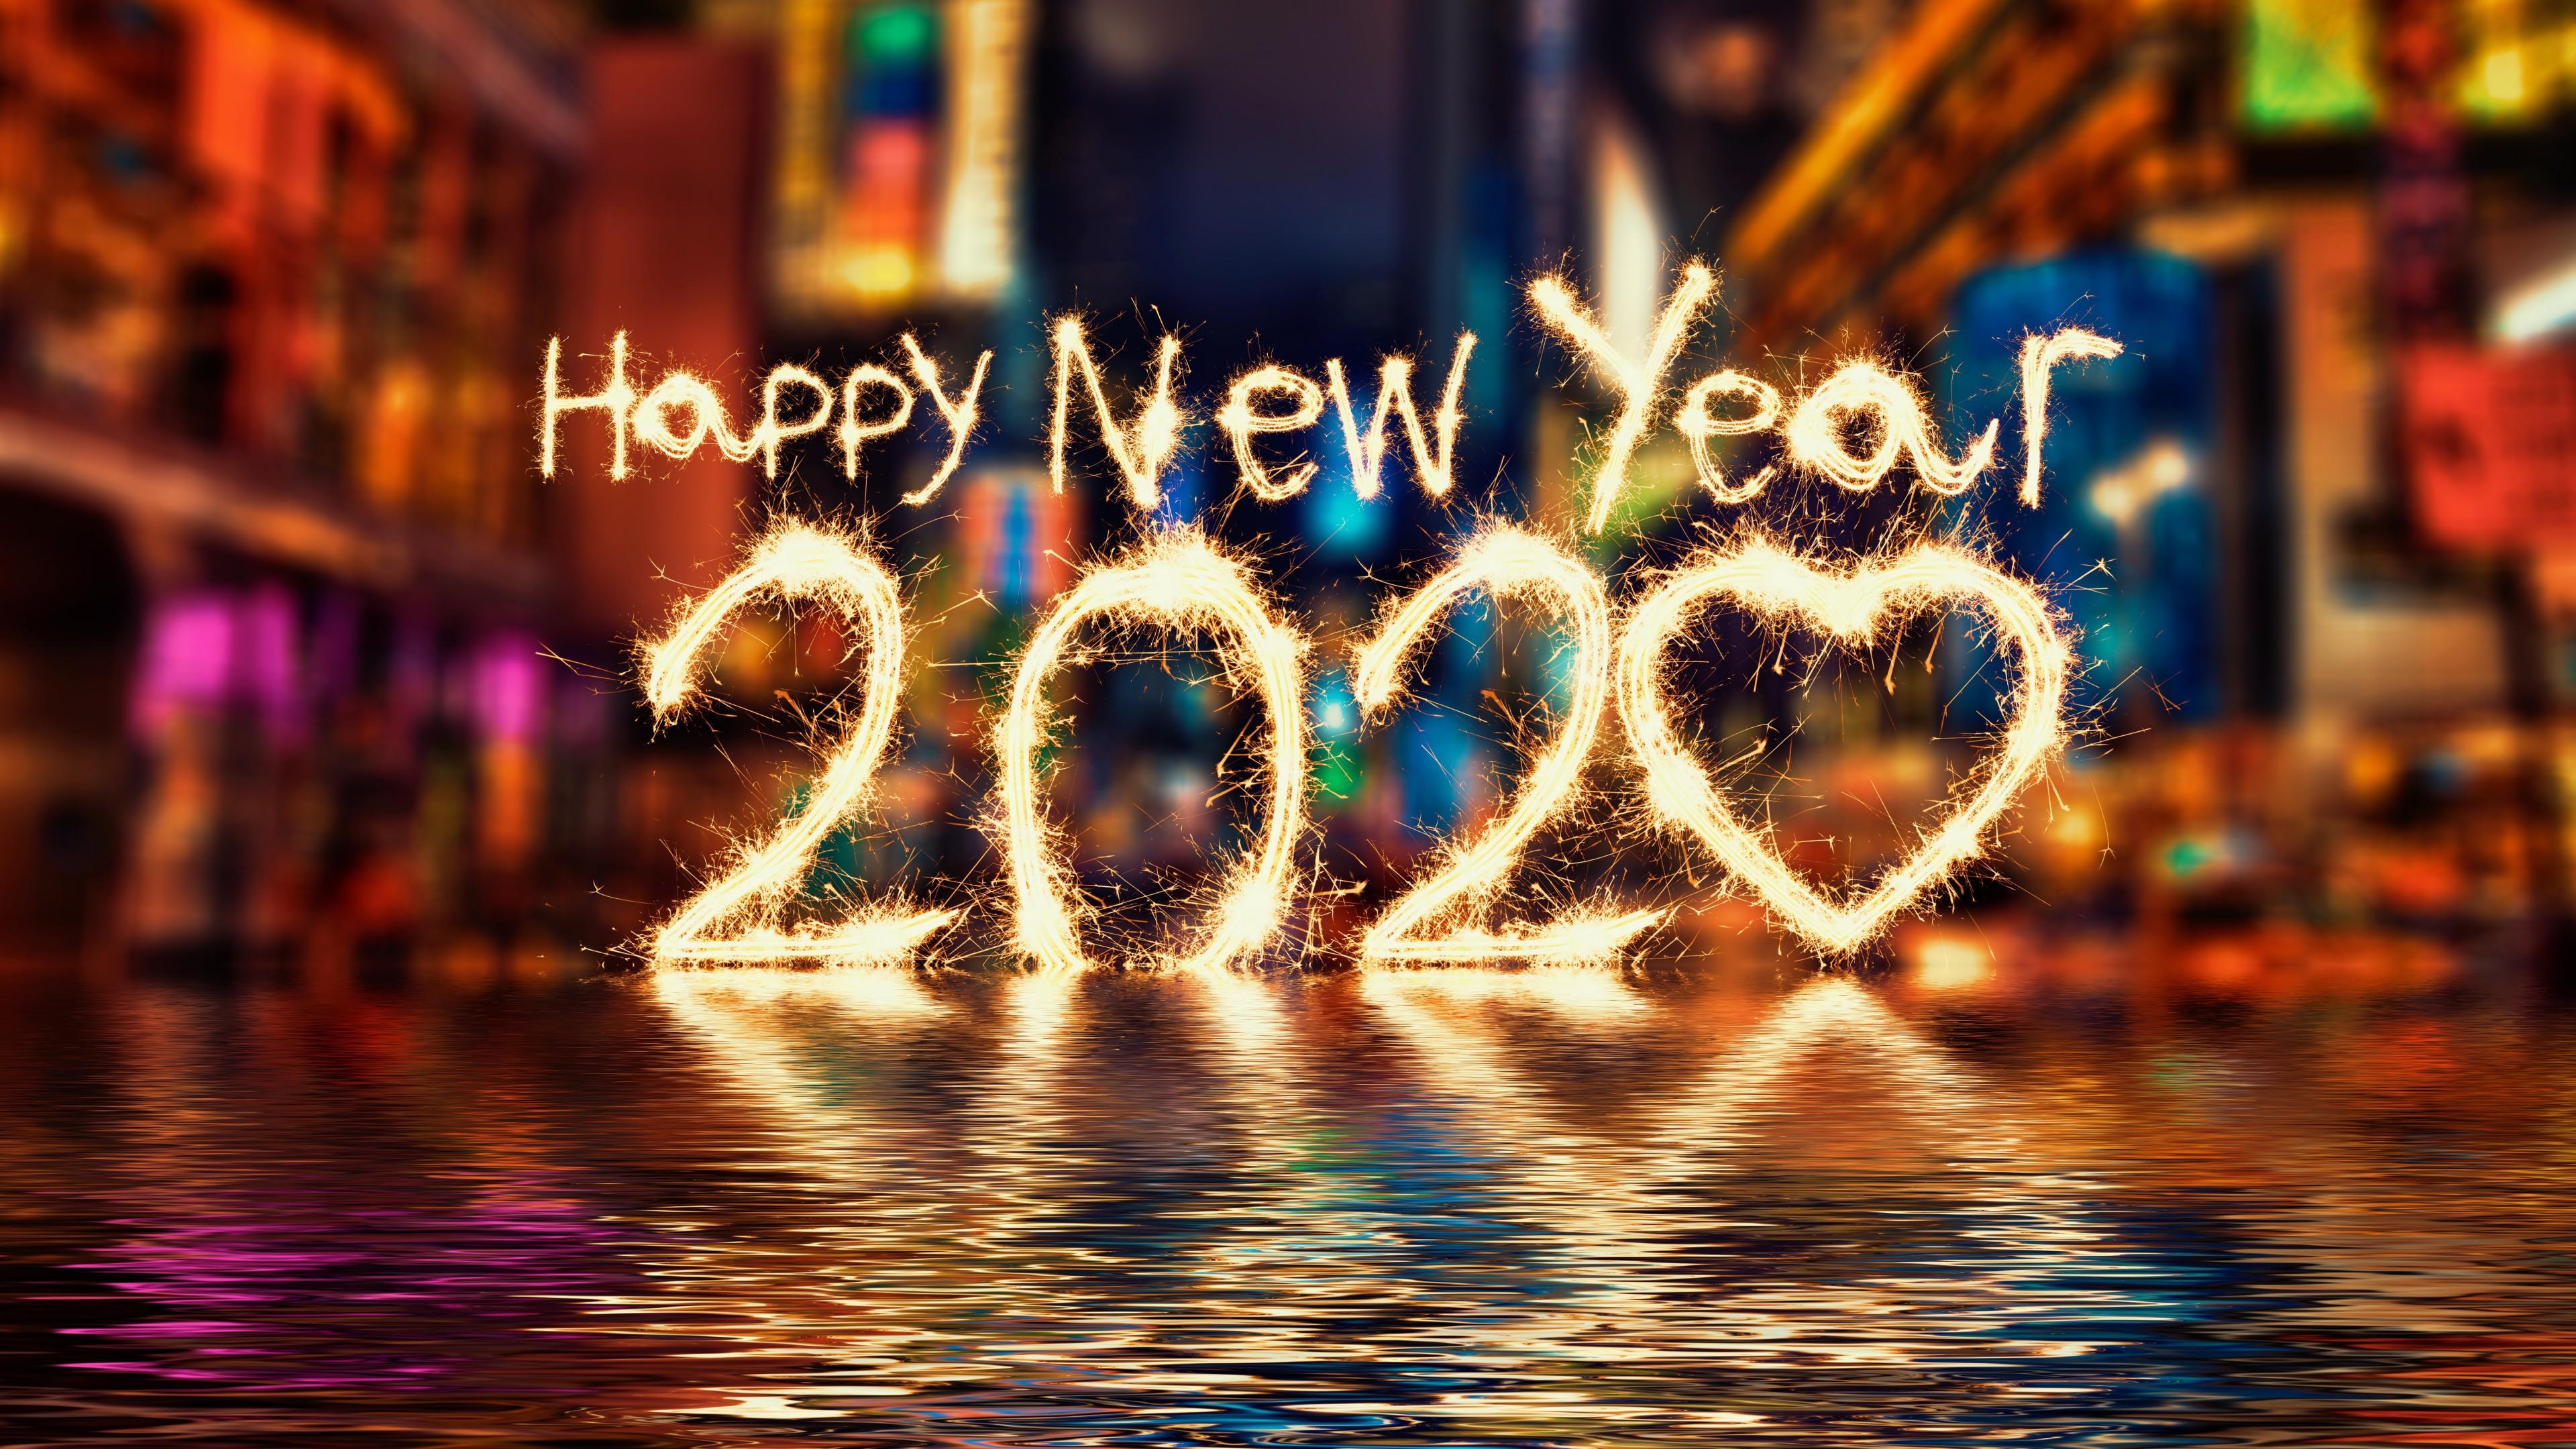 Happy New Year 2020 Hd Wallpaper 4k For Desktop   Happy New Year 3840x2160